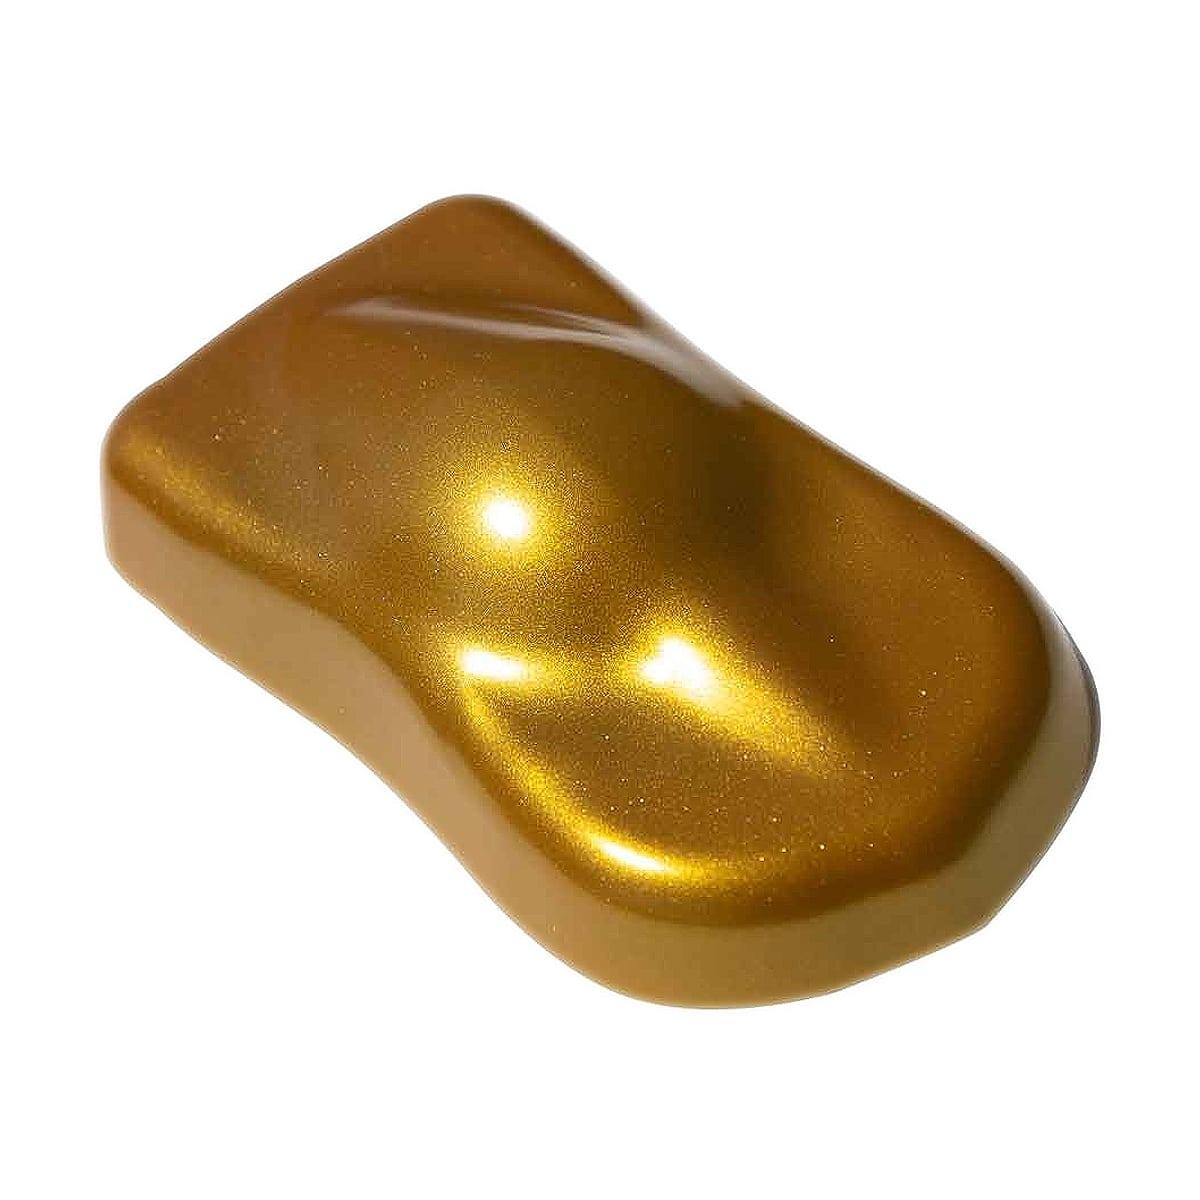 Eastwood Hot Powder Coat 3D Shimmering Metallic Halcyon Gold (8 oz.)